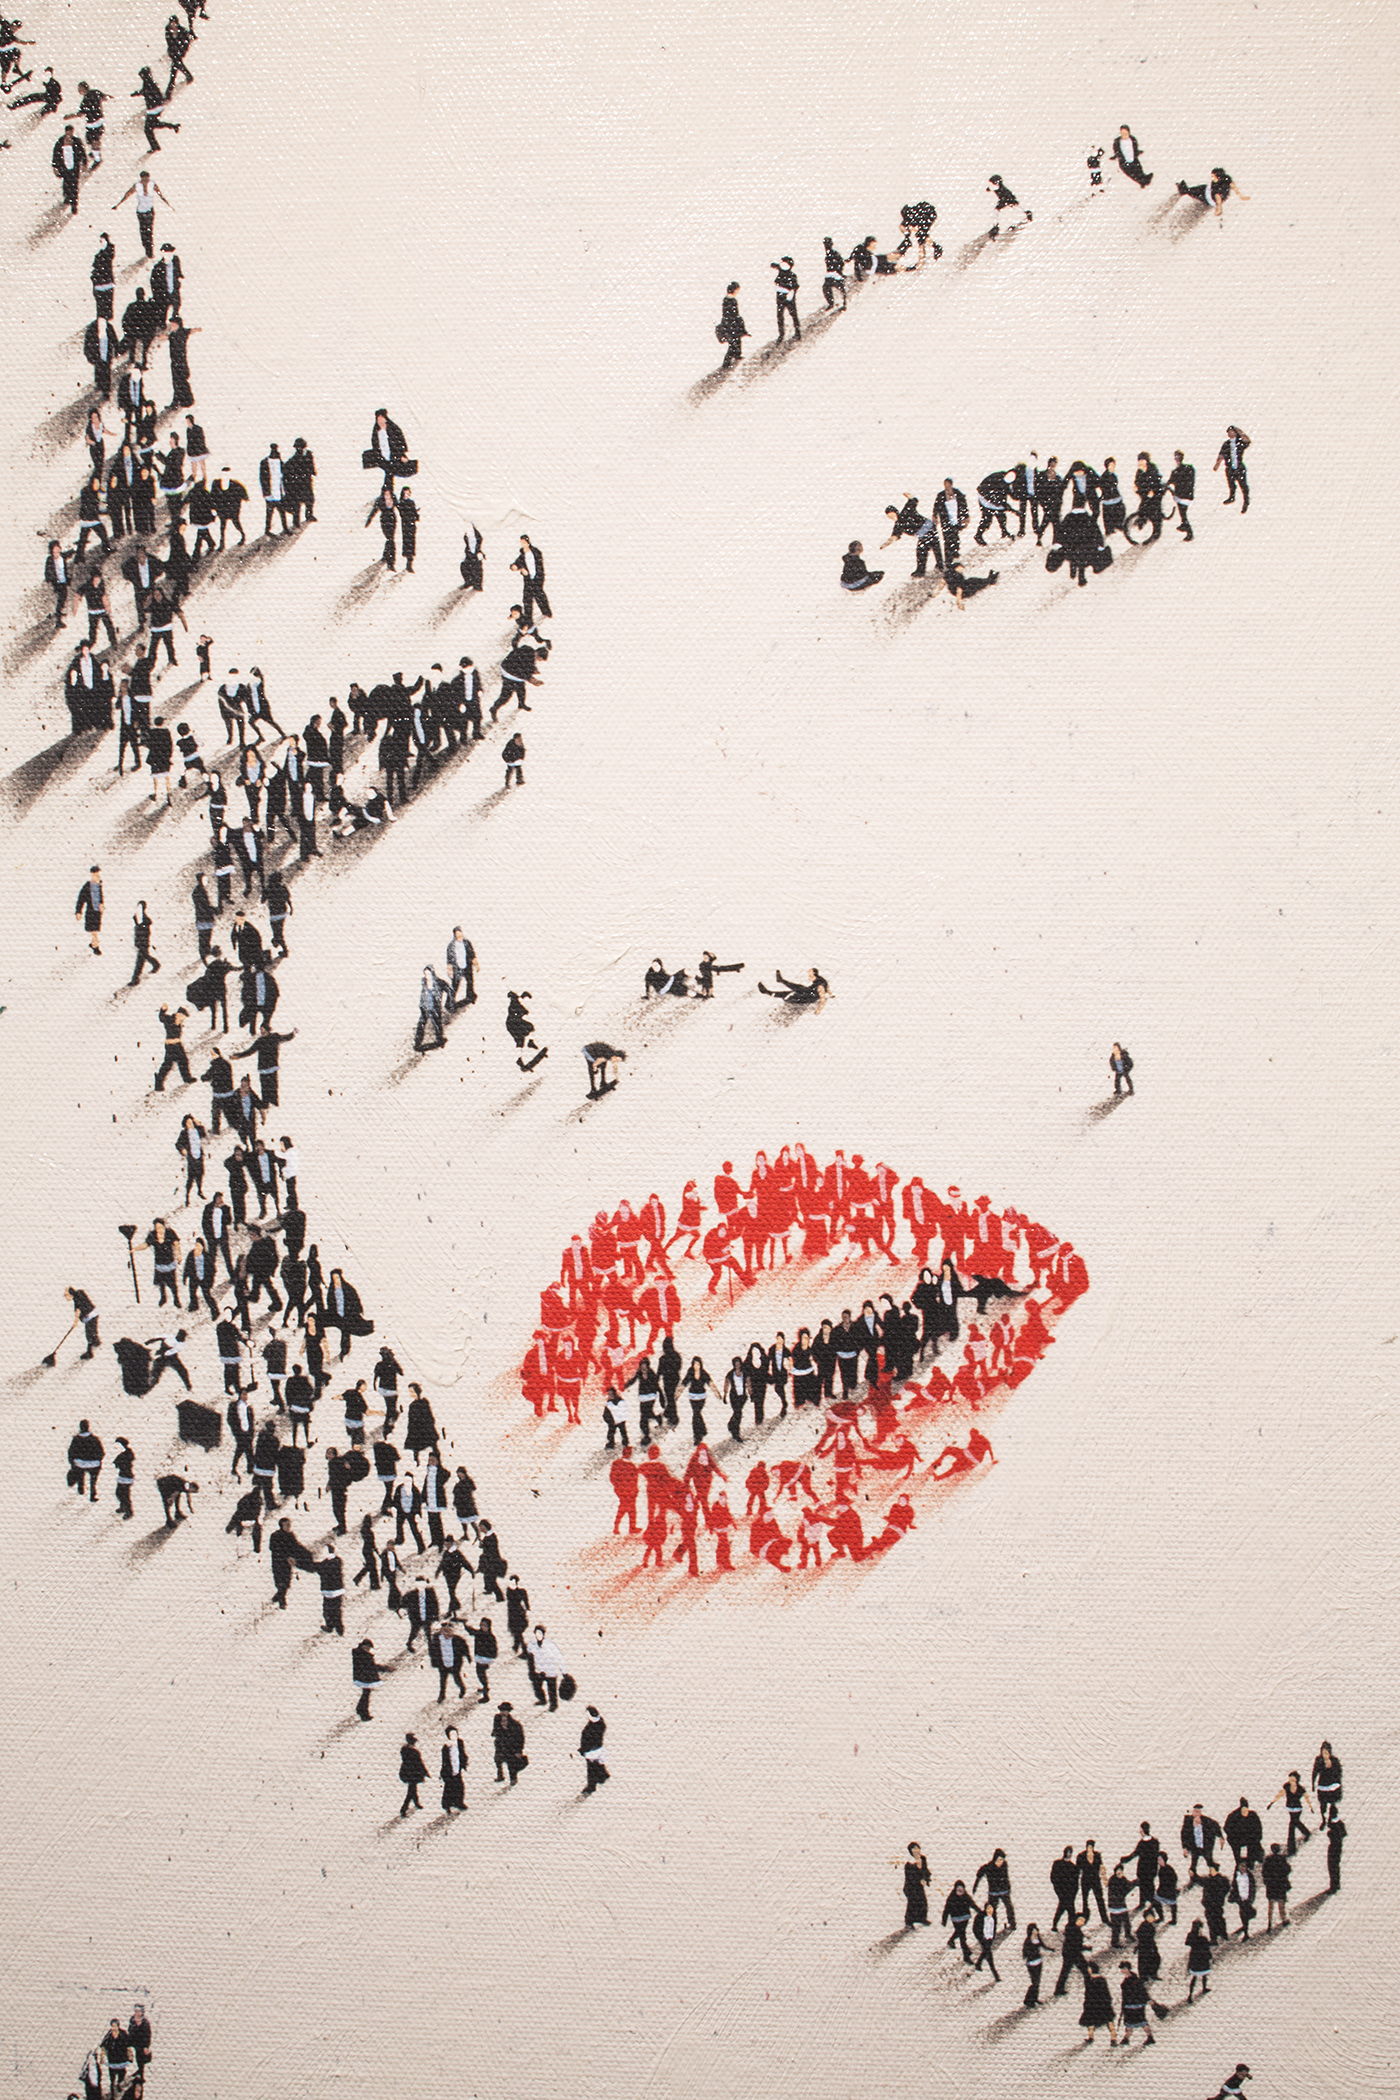 Artwork – Marilyn Monroe